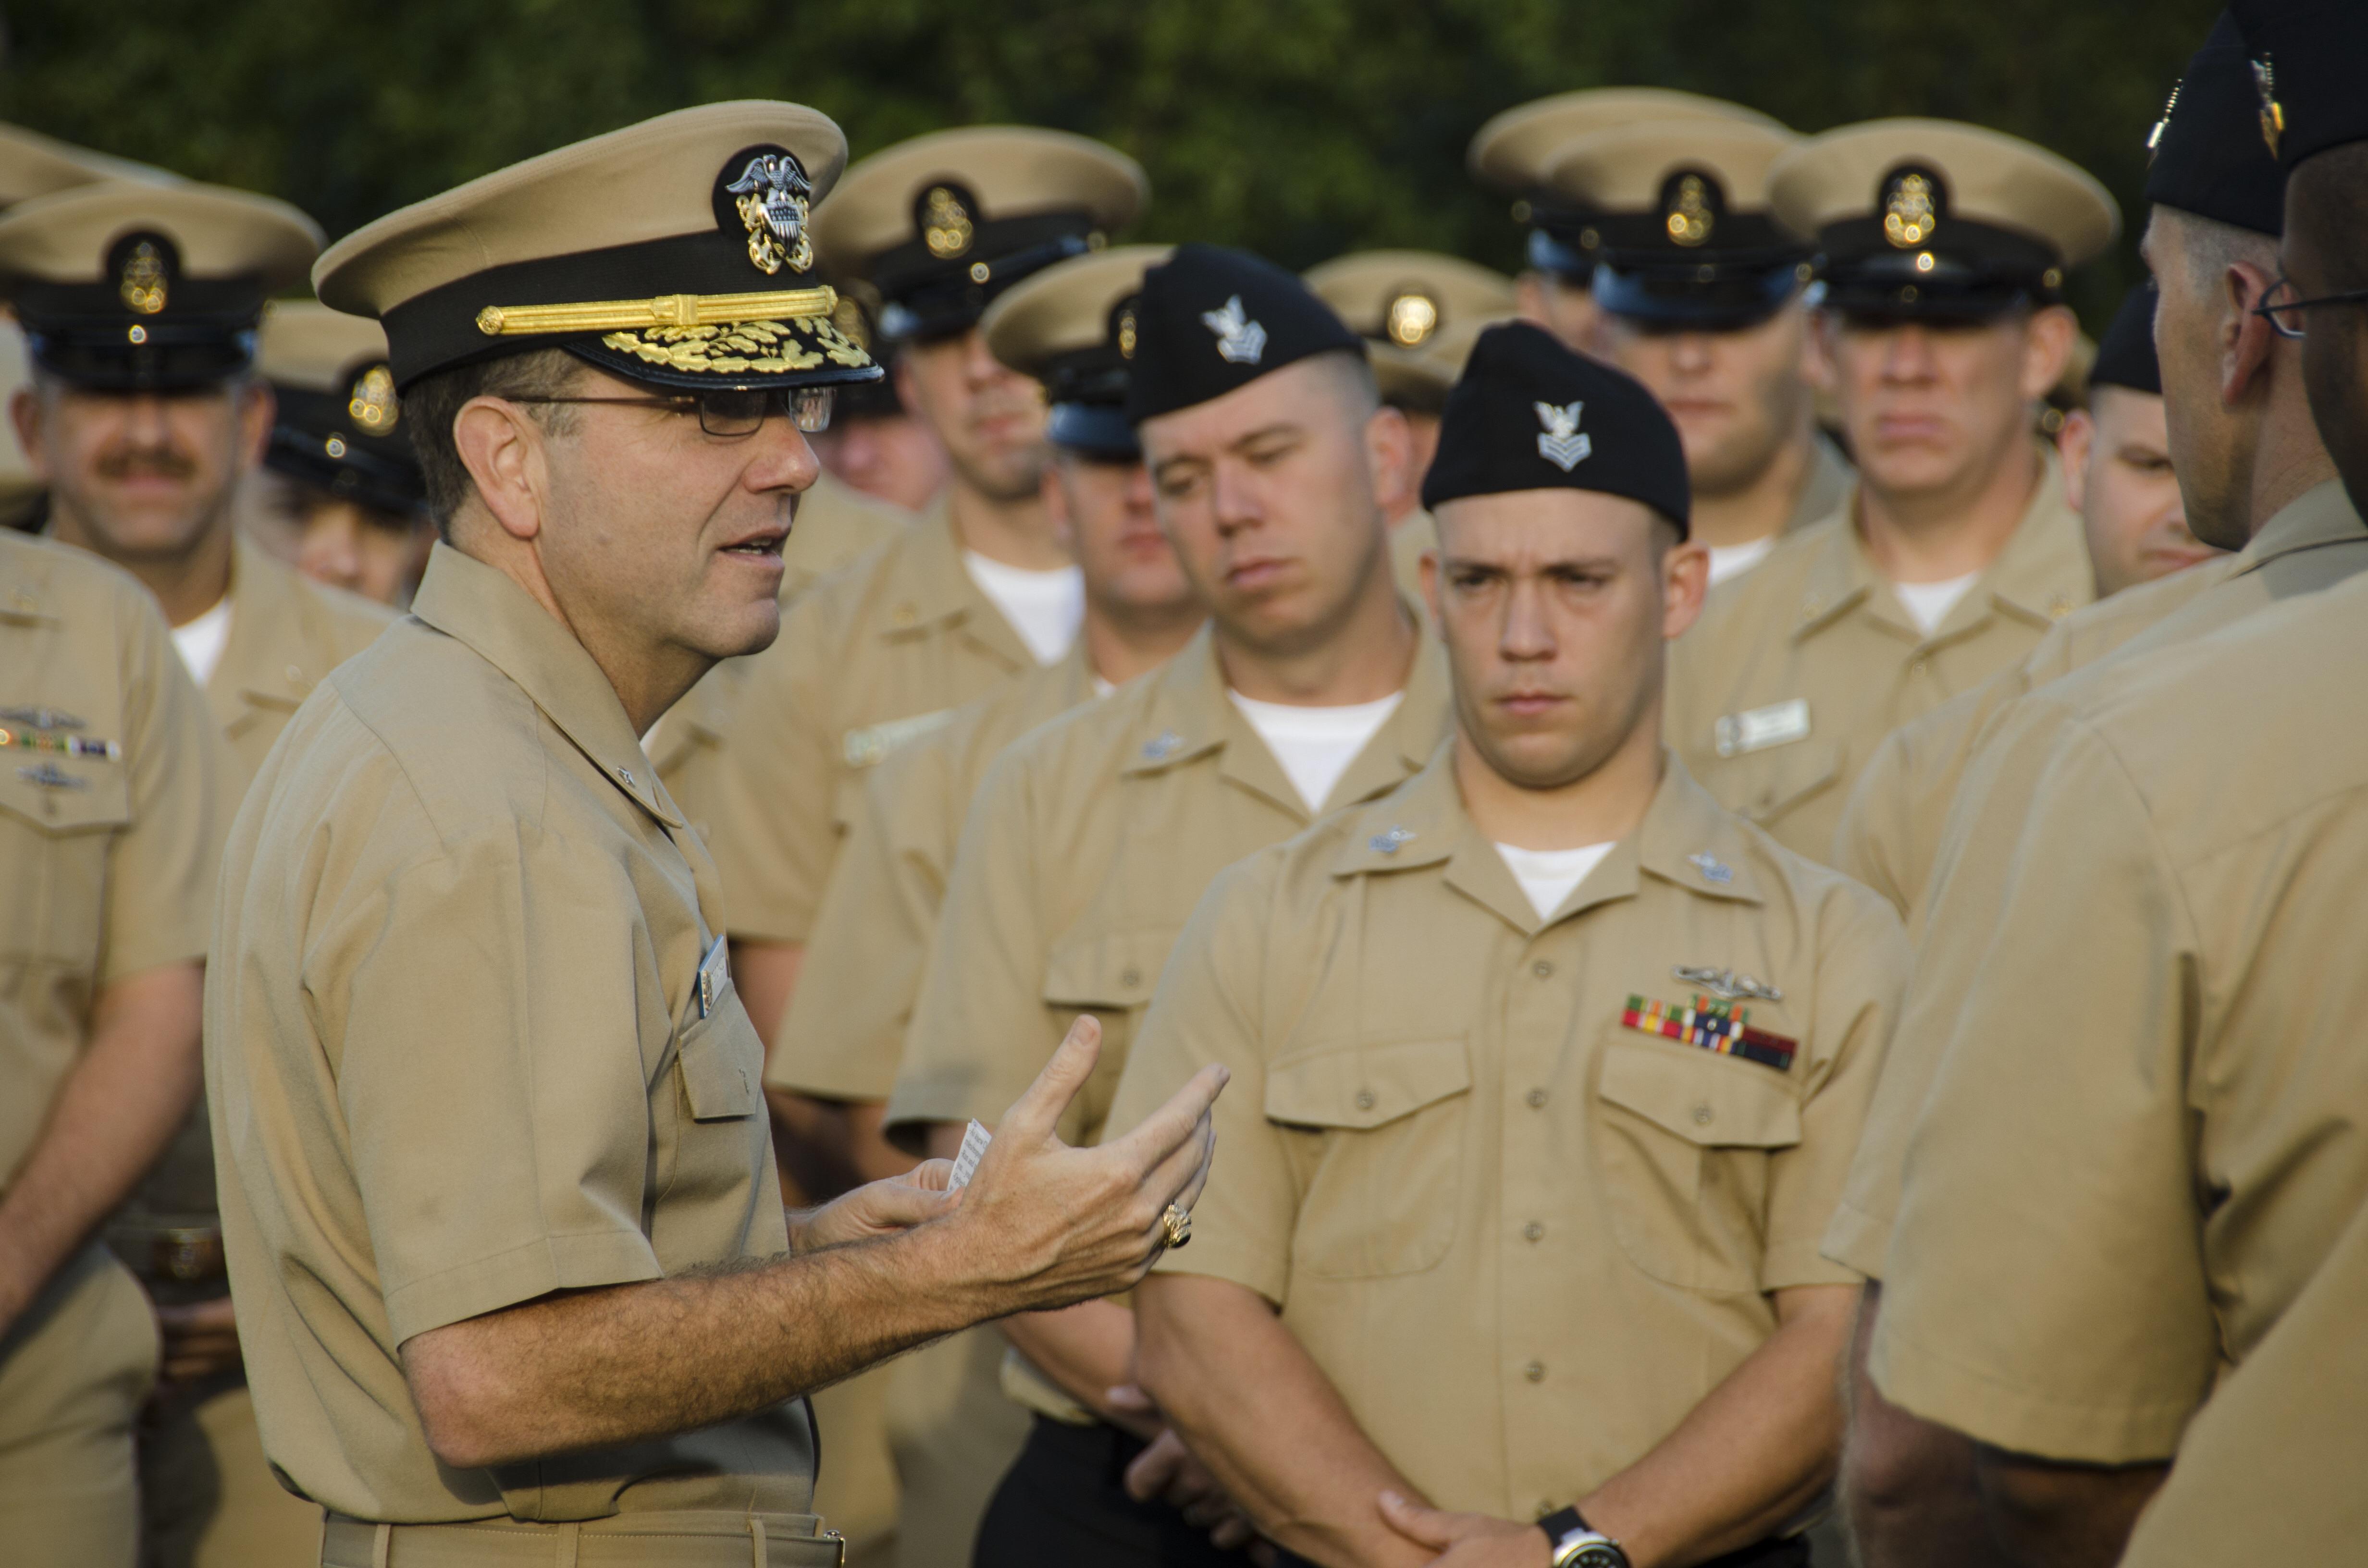 Rear Adm. Joseph Tofalo in 2012. US Navy Photo